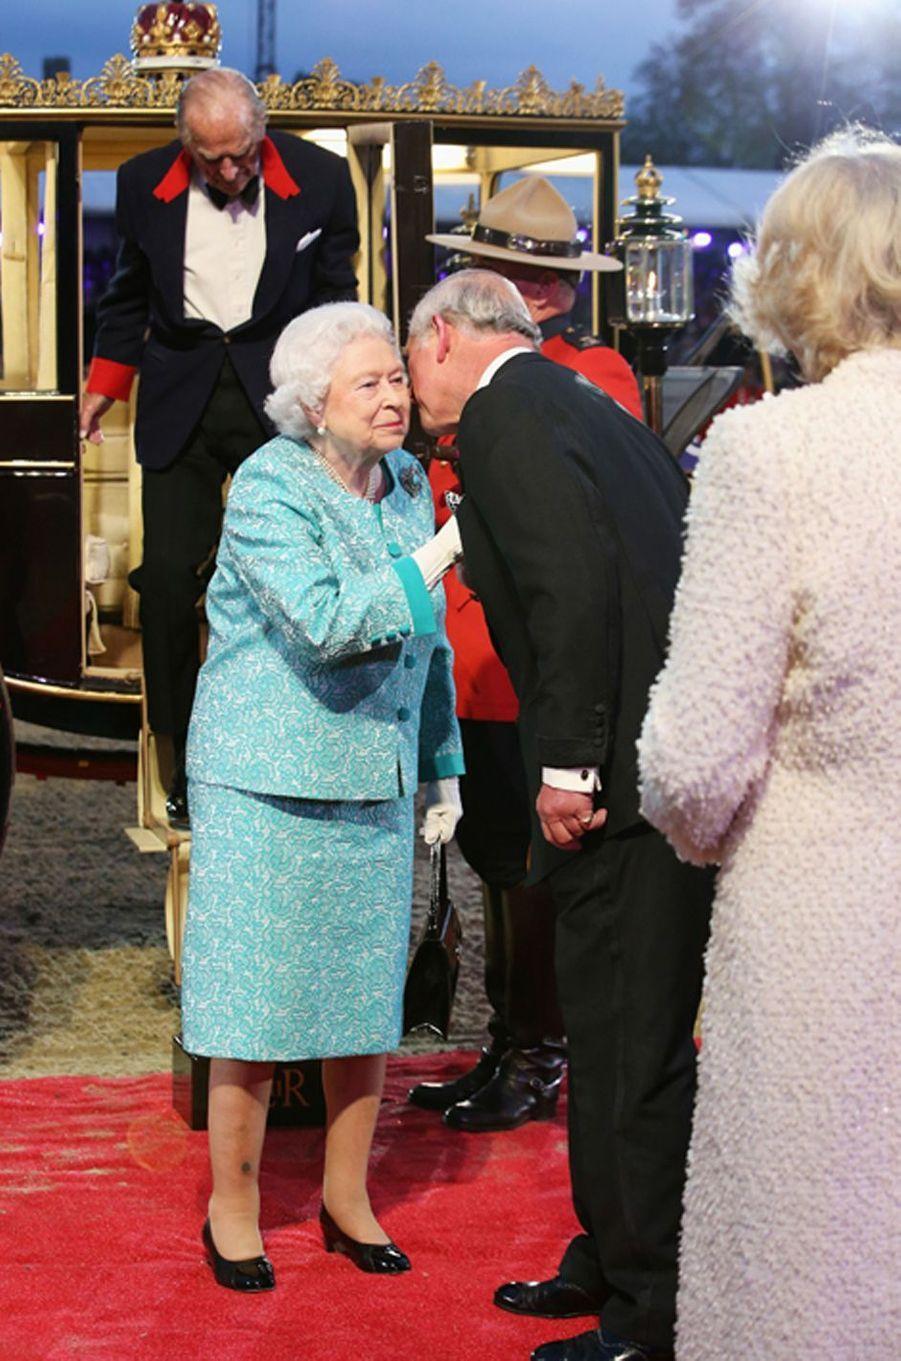 La reine Elizabeth II et le prince Charles à Windsor, le 15 mai 2016